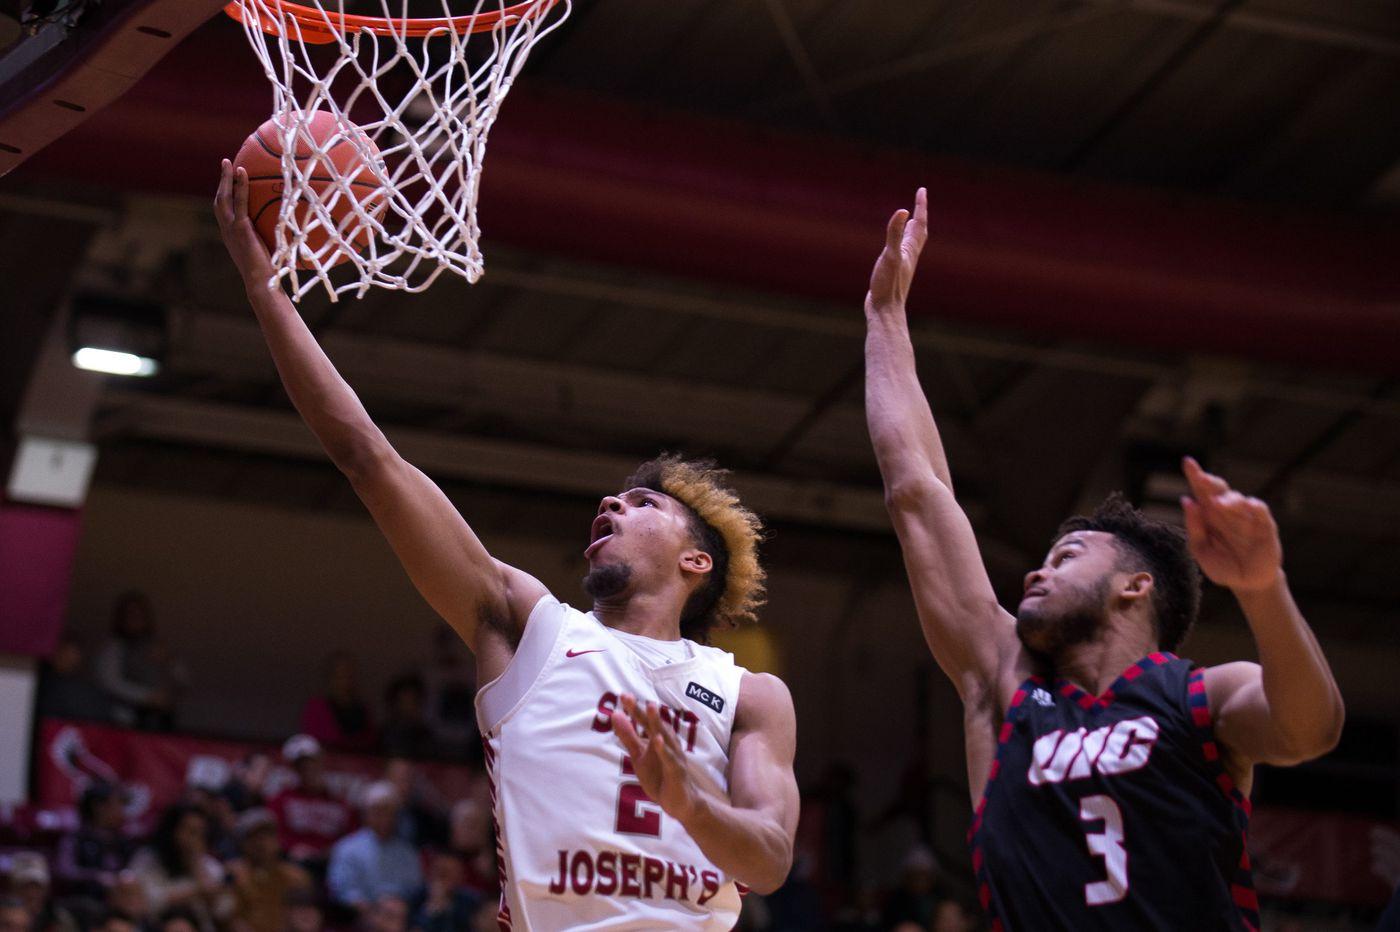 Fresh Kimble scores a career-high 31 to lead St. Joseph's past UIC